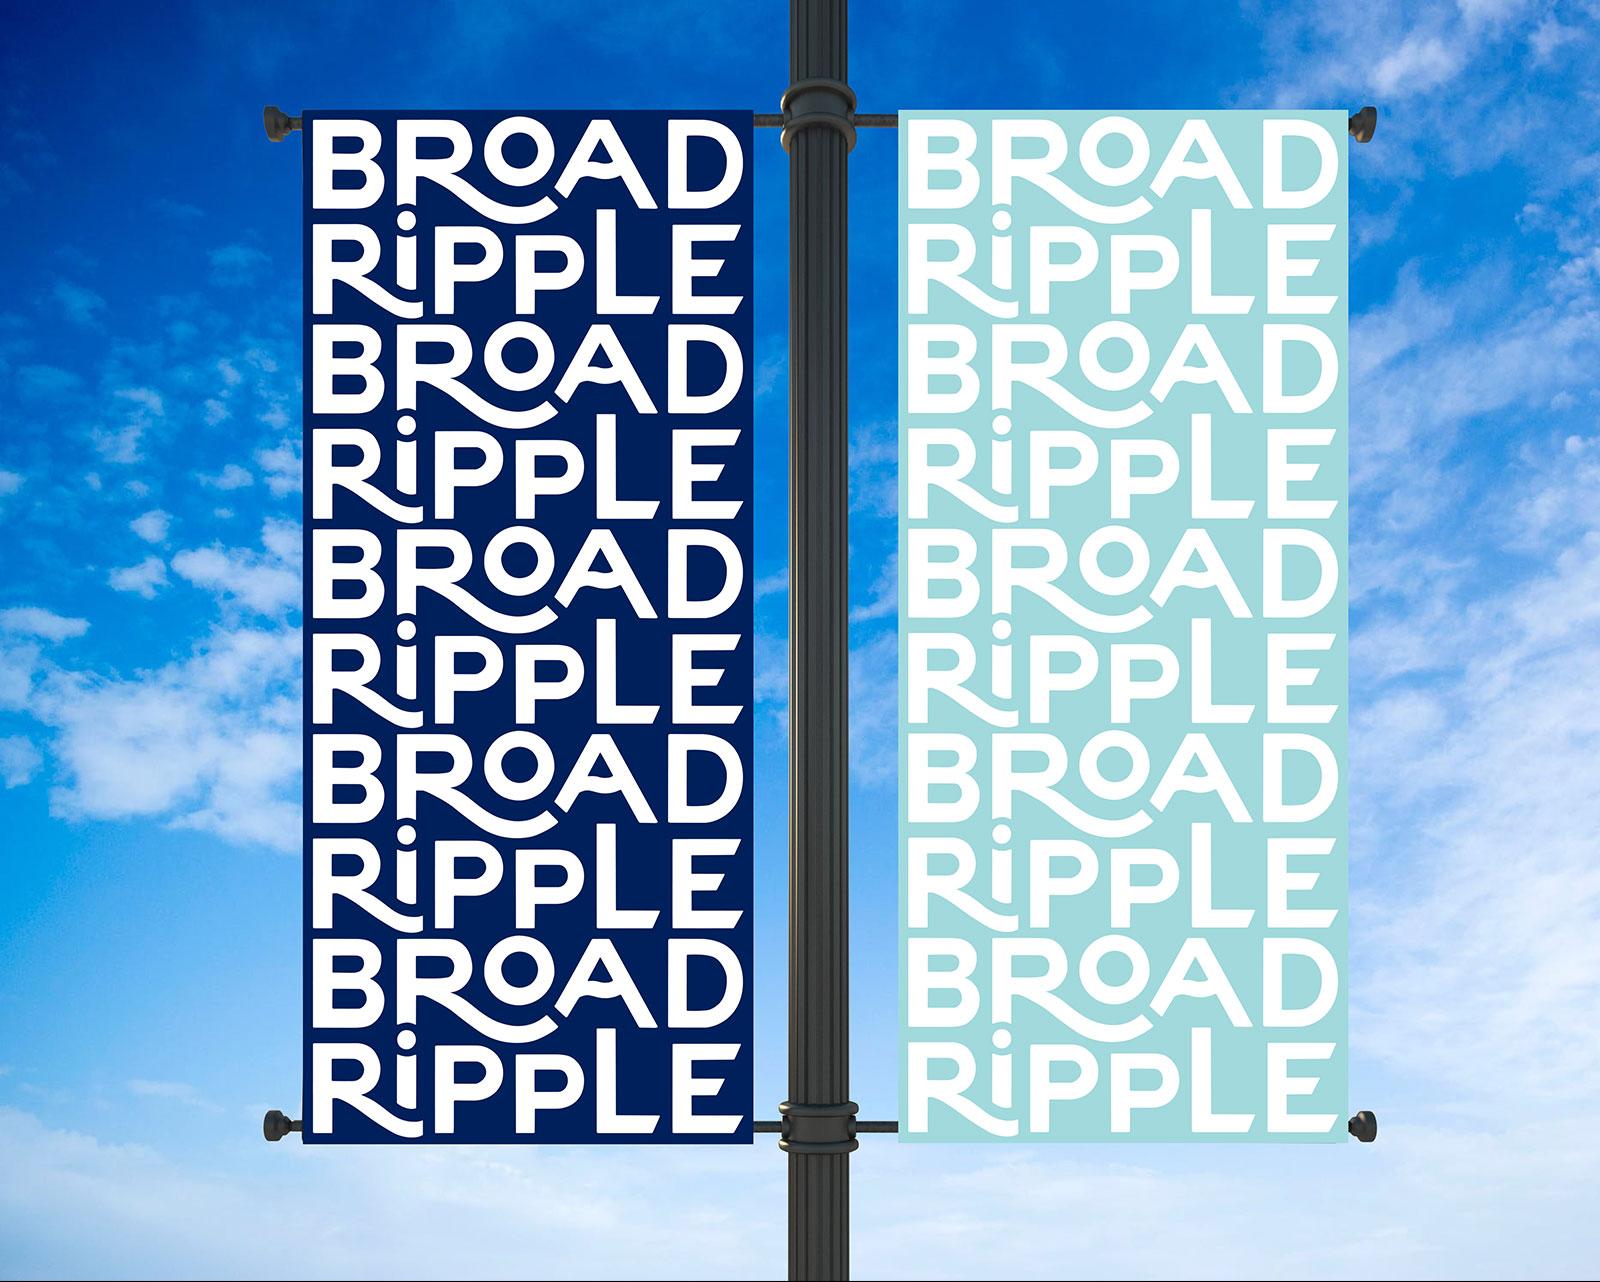 kimball_broadripple11.jpg